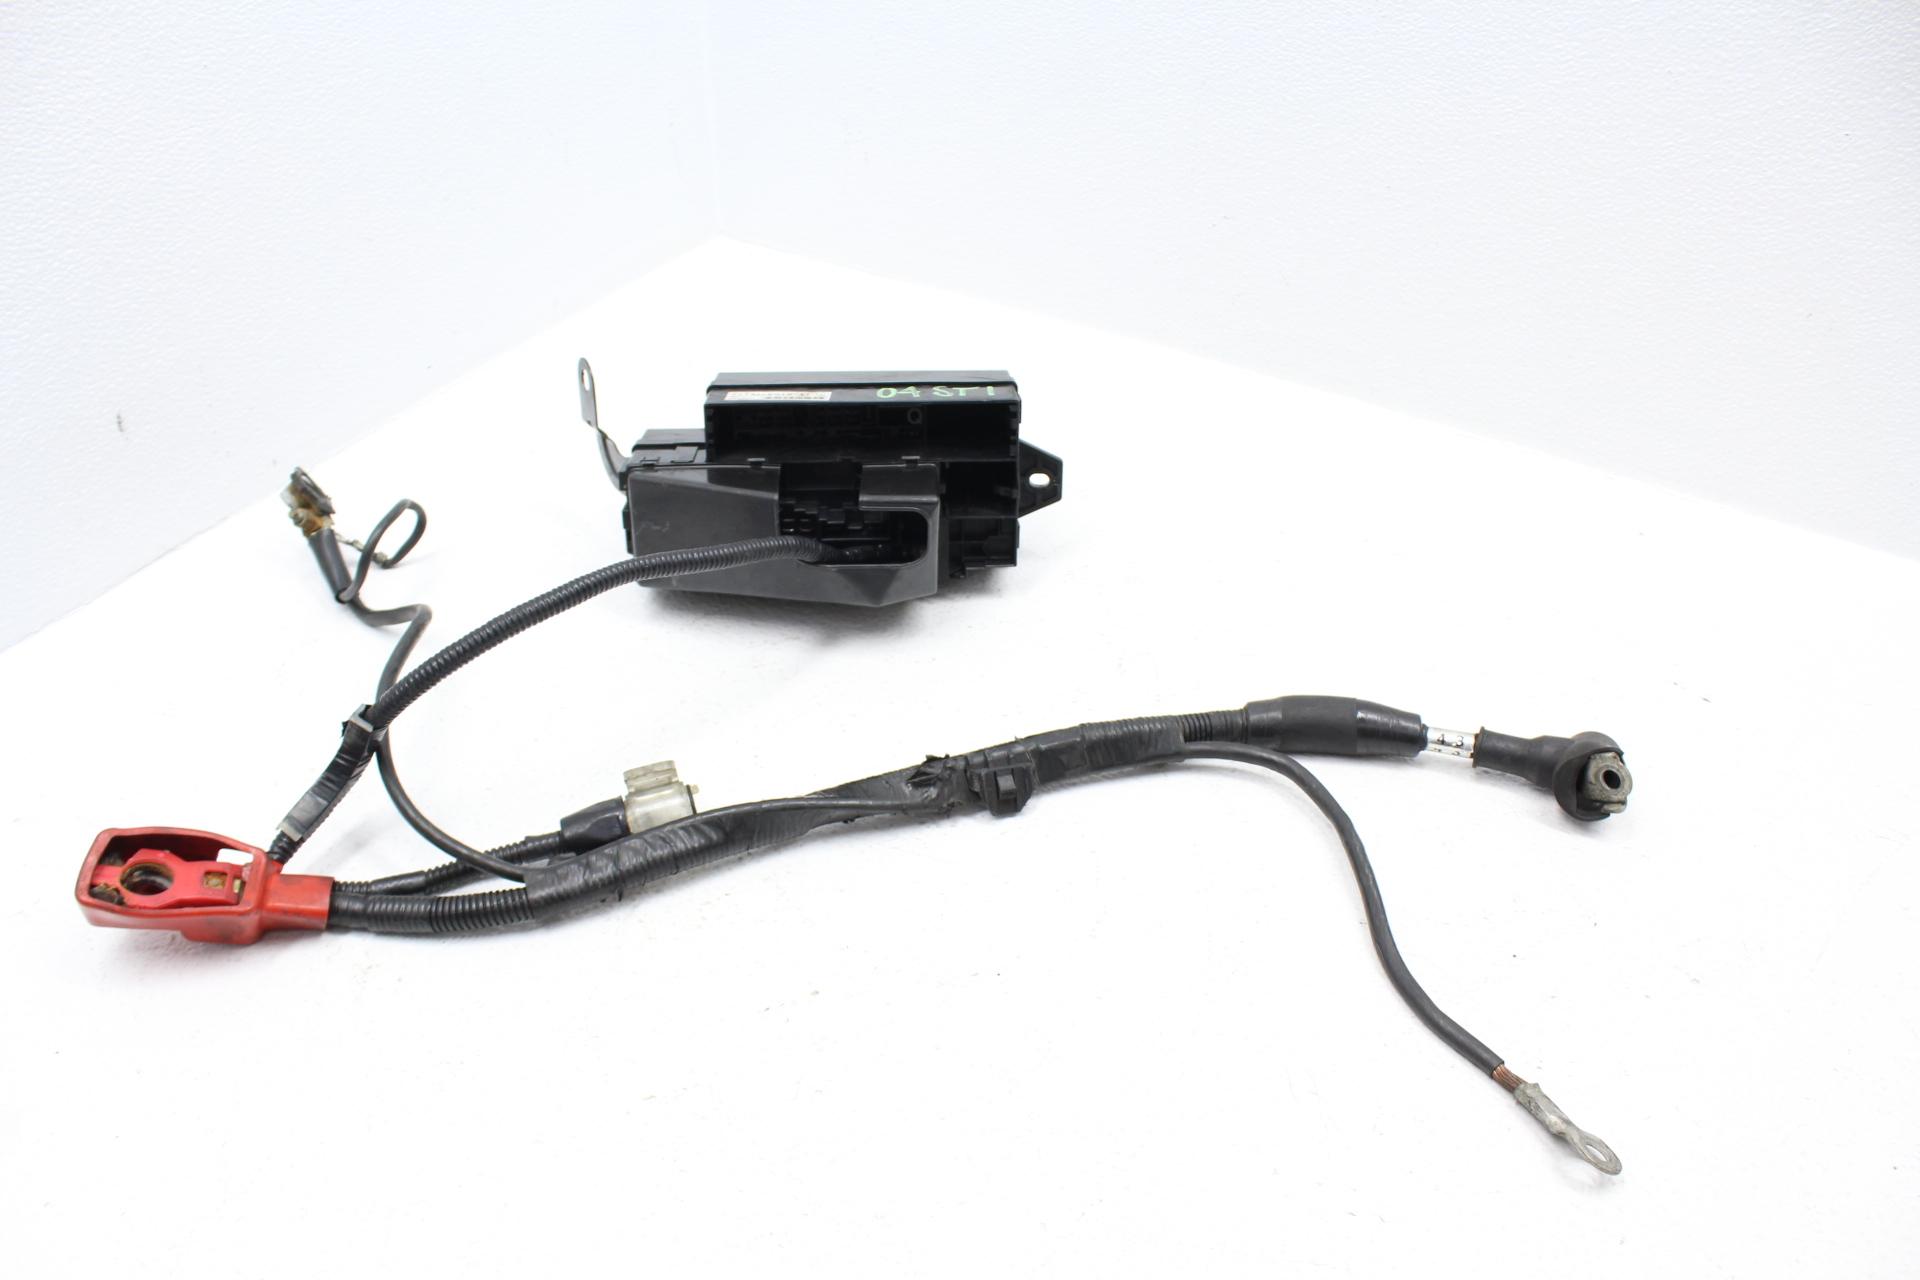 2002-2005 SUBARU IMPREZA WRX & STI ENGINE BAY FUSE BOX PANEL BATTERY HARNESS